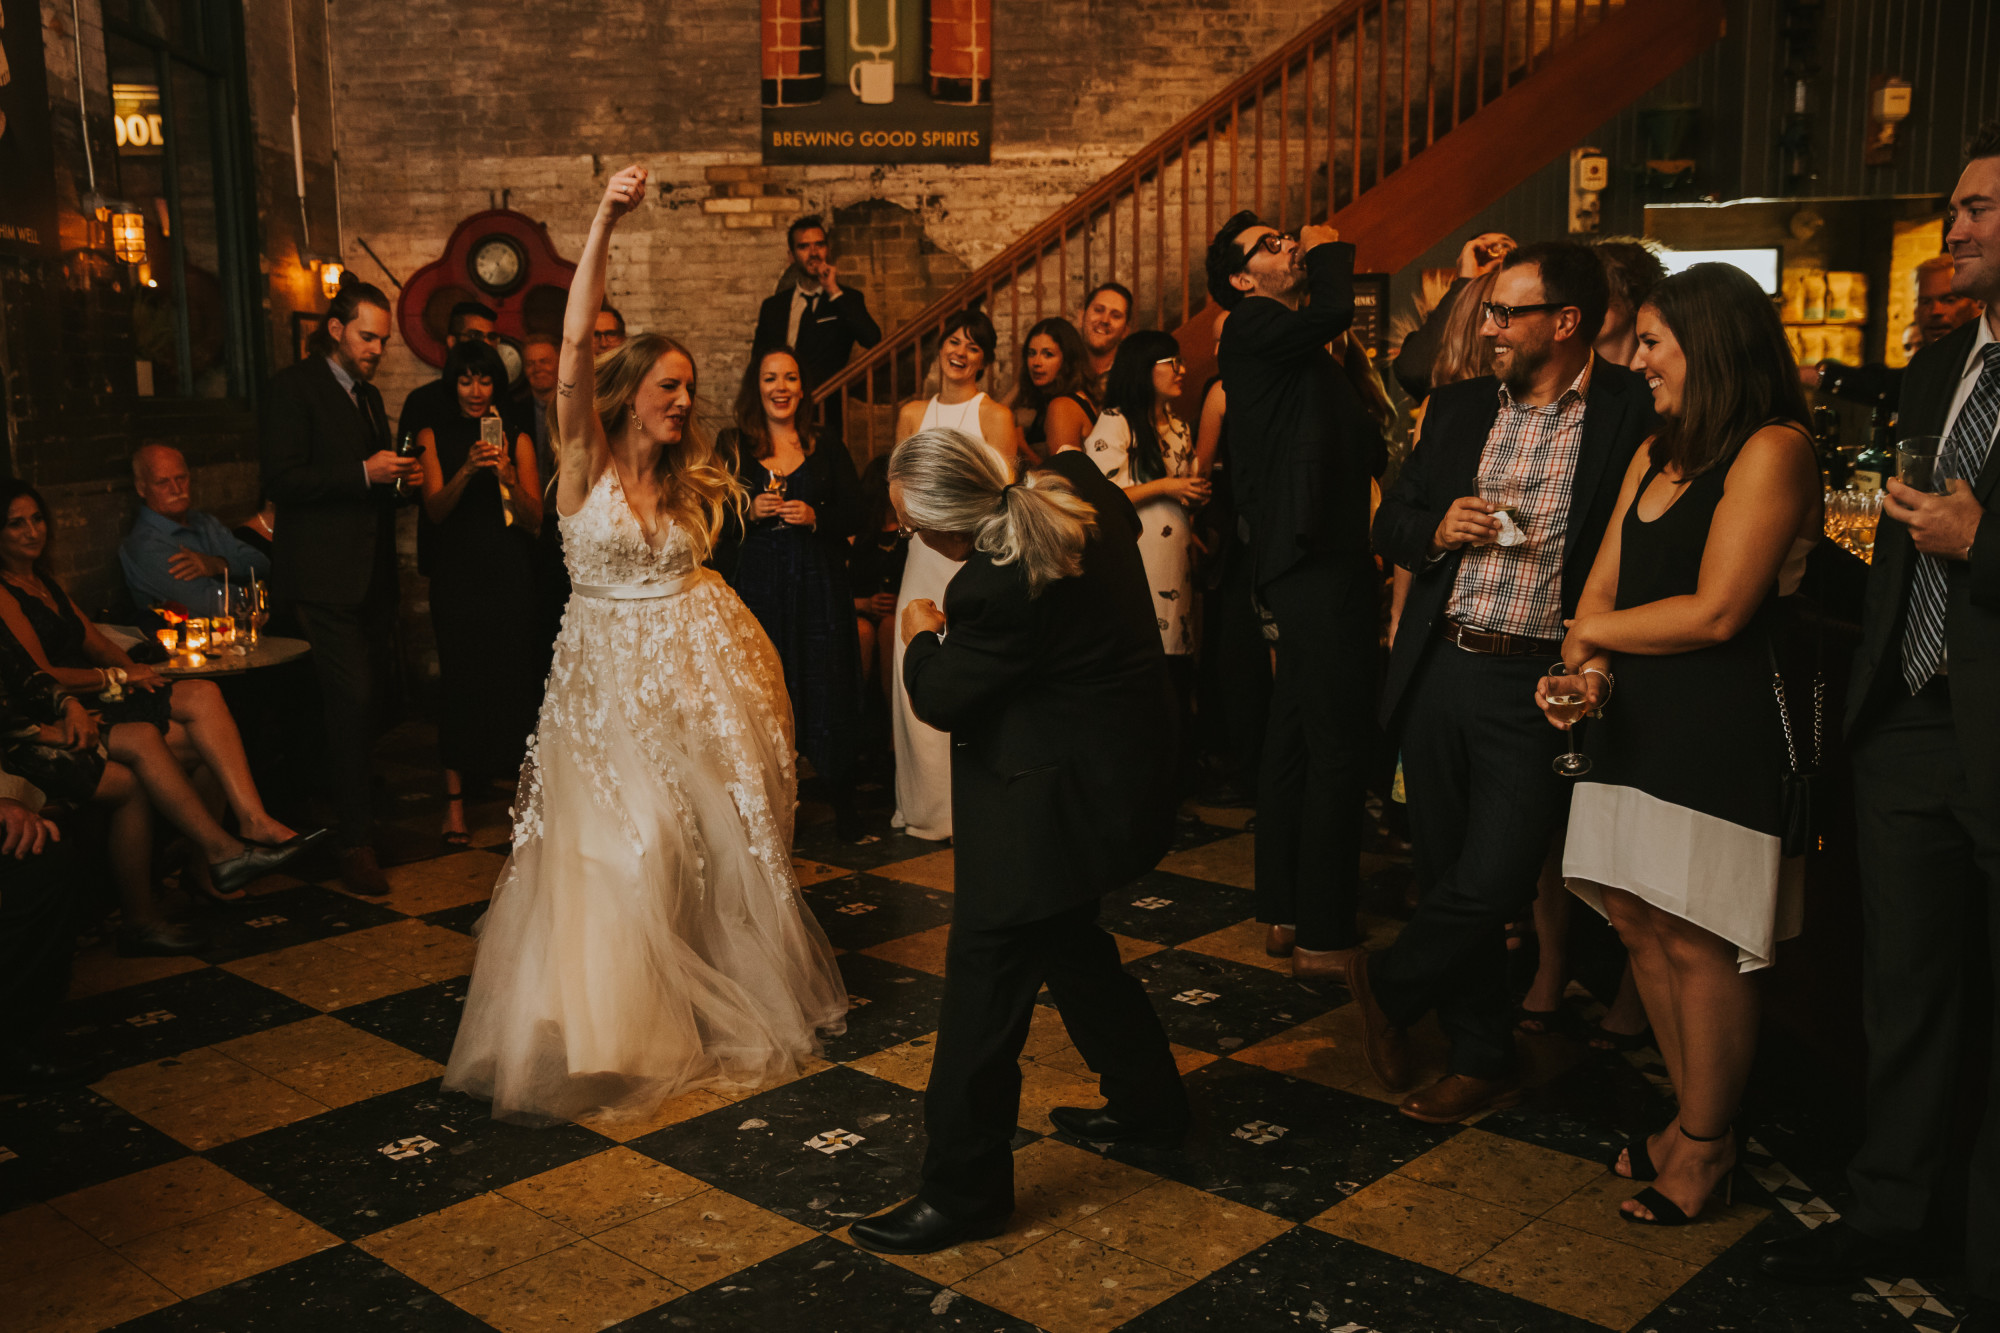 Beth-Ted-Balzacs-Coffee-Distillery-District-Toronto-Wedding-Planning-INLY-Events-Lushana-Bale-Photography-0322.jpg